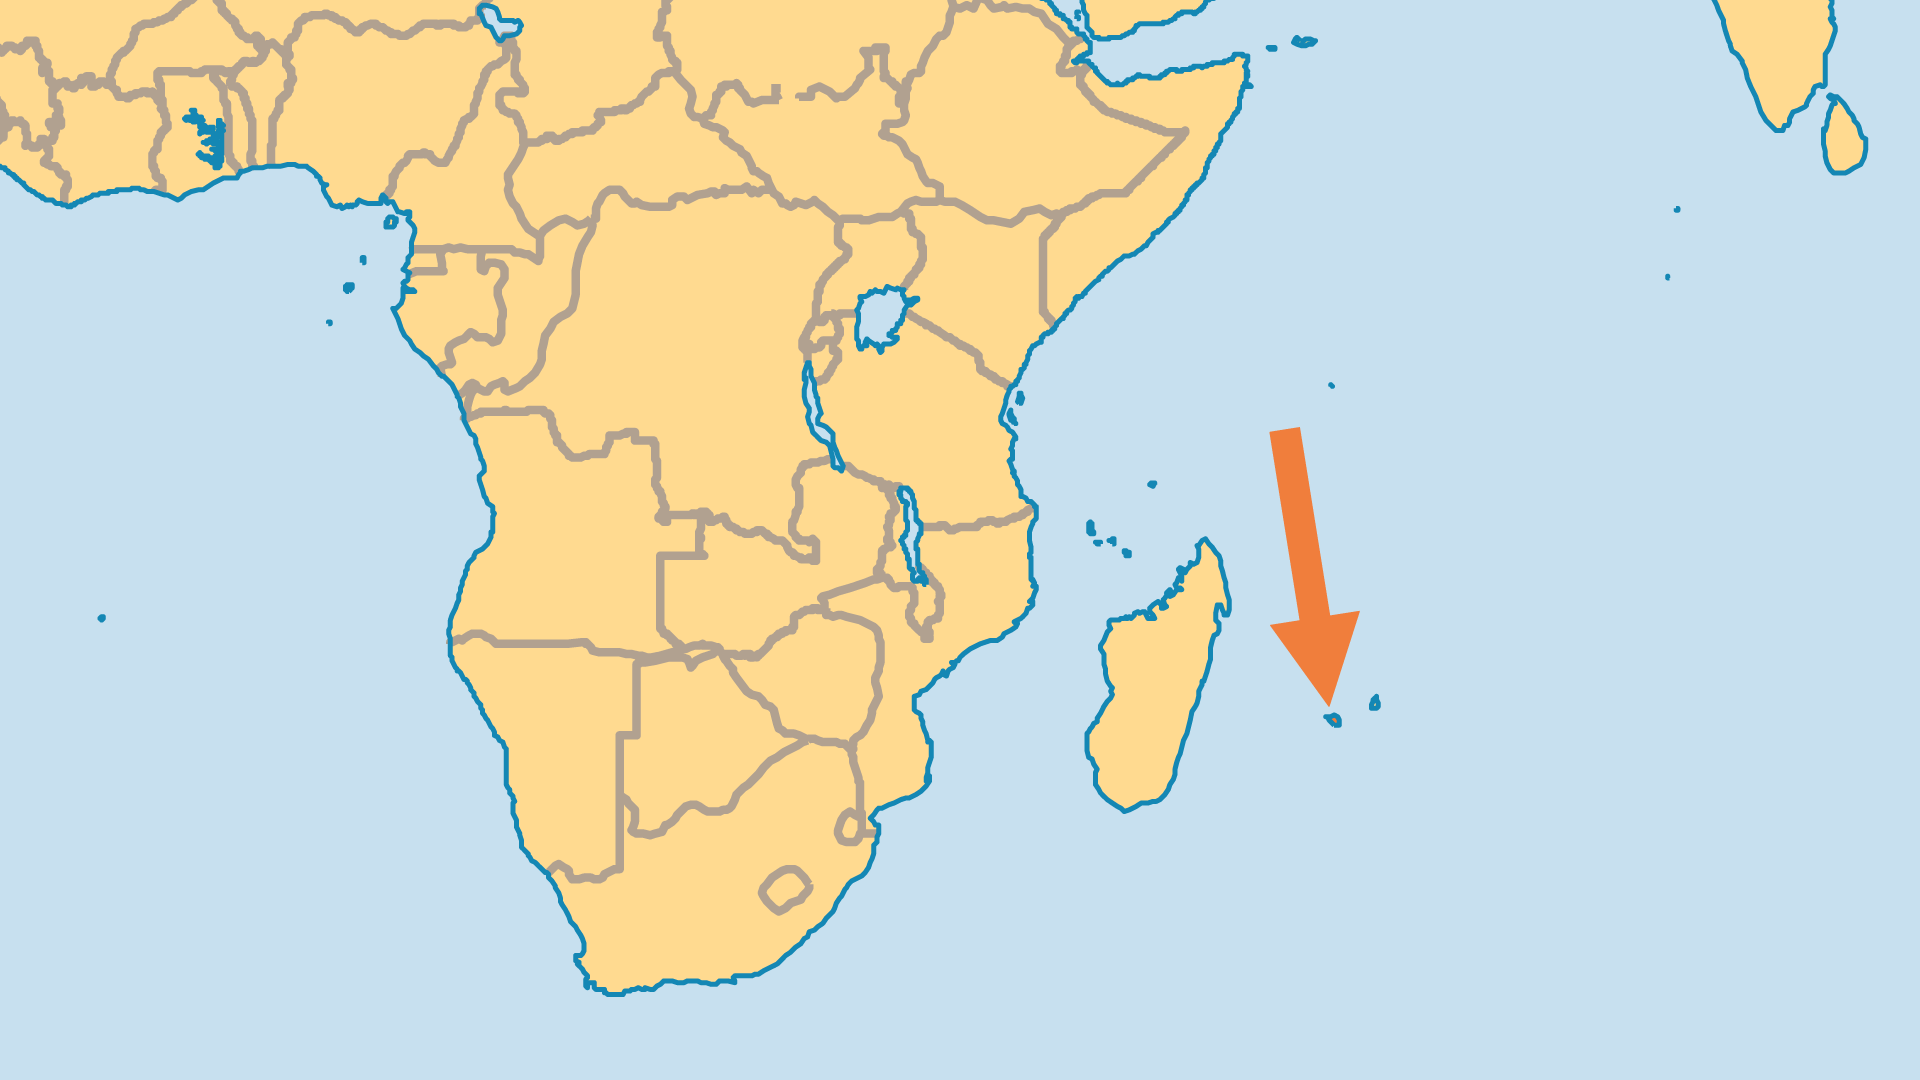 Locator Map for Reunion